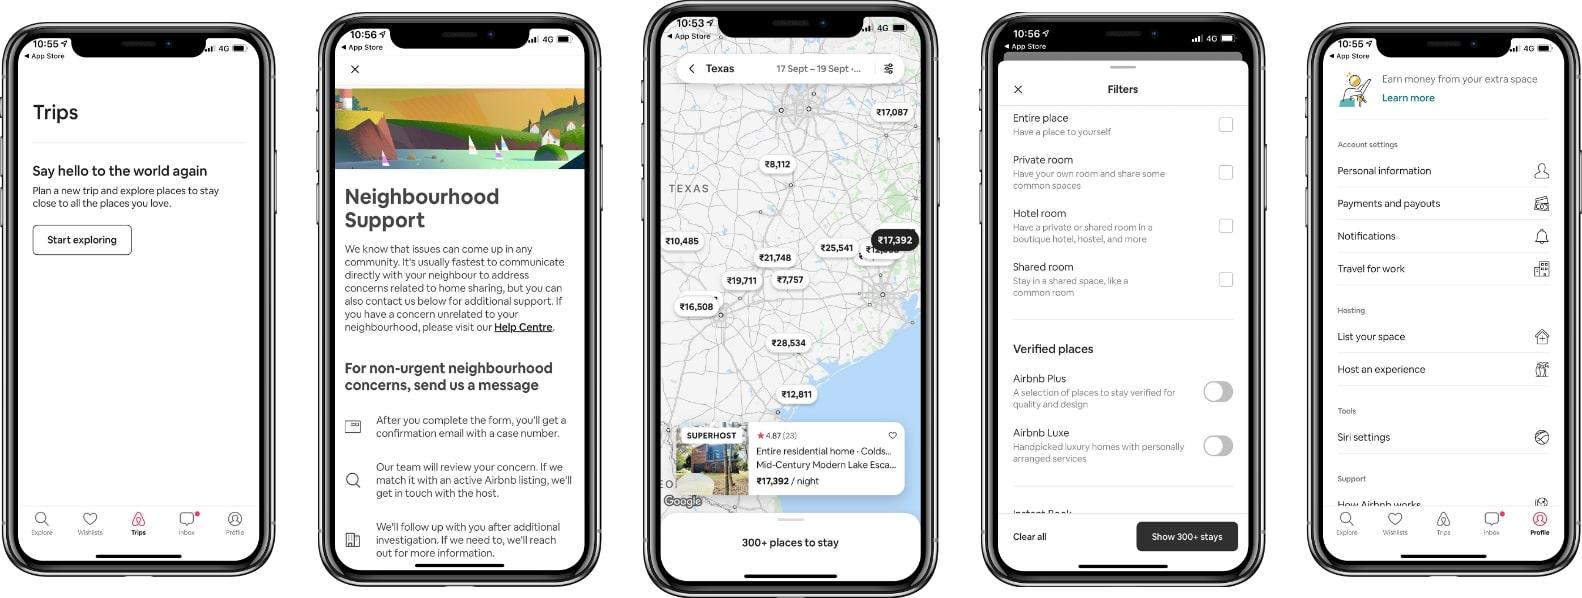 airbnb app design screenshot